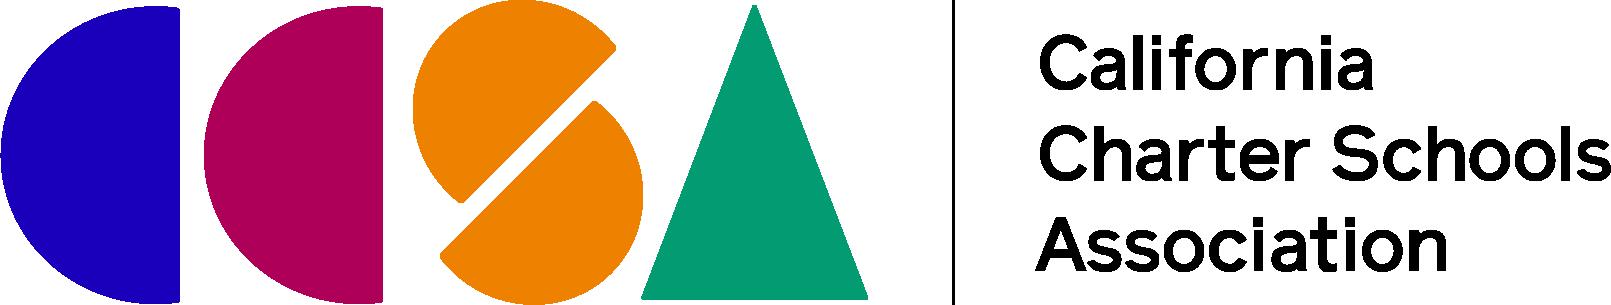 California Charter School Association logo